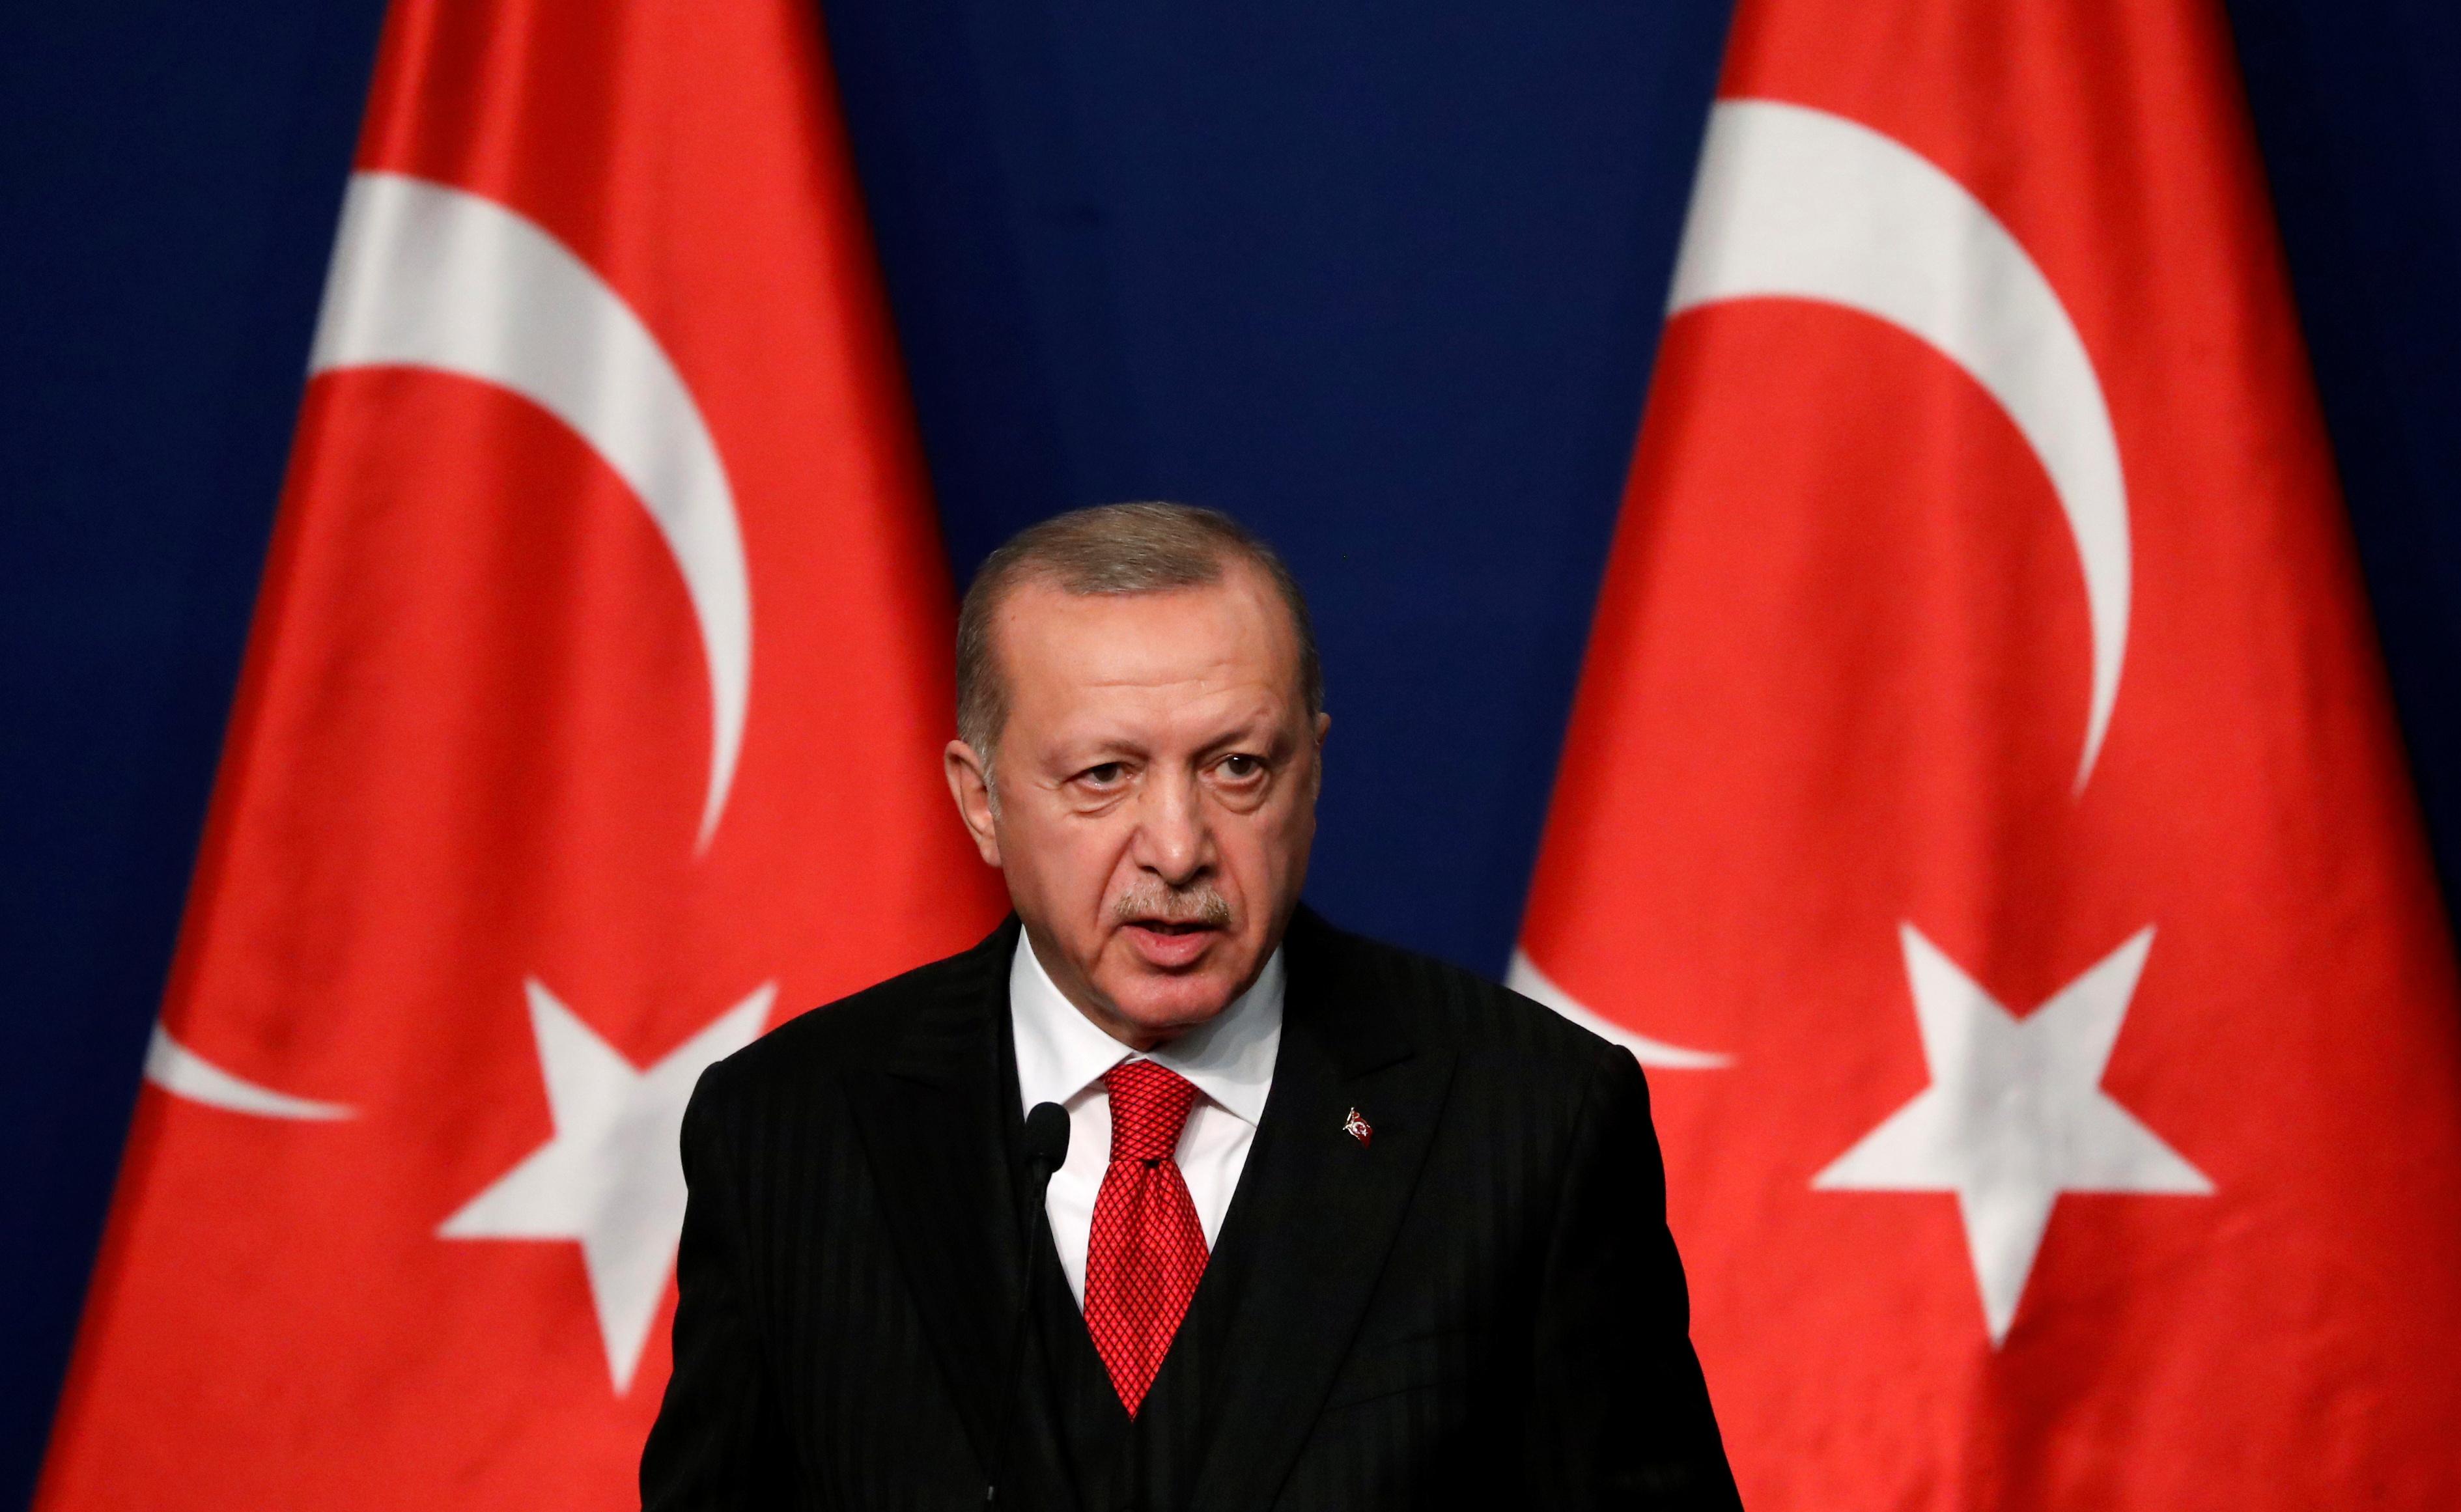 Turkish President Tayyip Erdogan attends a news conference in Budapest, Hungary, November 7, 2019. REUTERS/Bernadett Szabo